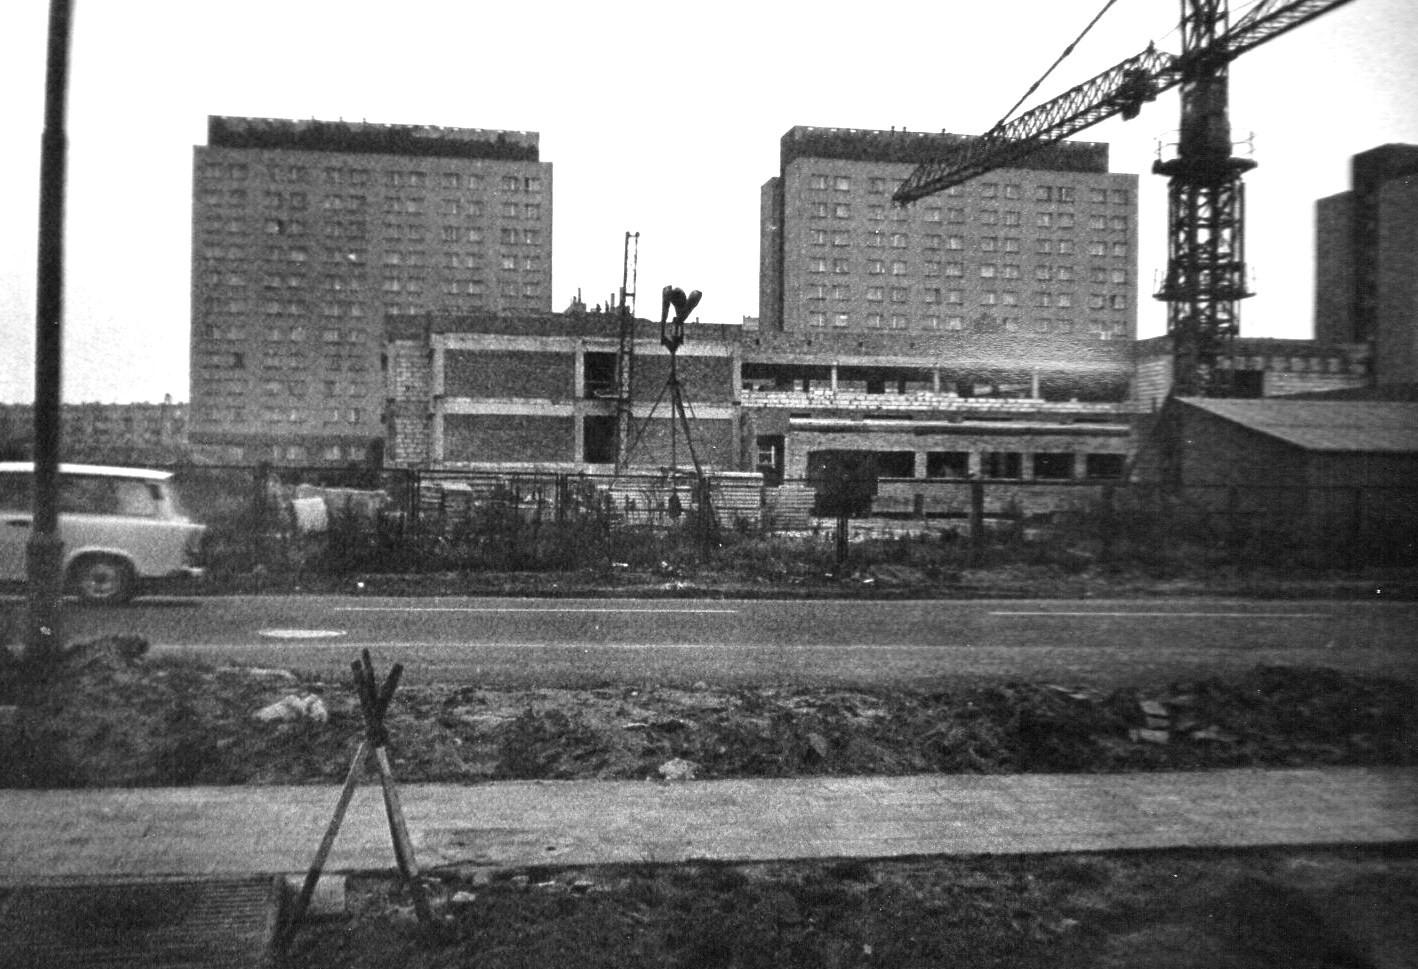 https://upload.wikimedia.org/wikipedia/commons/b/bd/Poznan%2C_ul._Piatkowska%2C_budowa_szpitala_UAM%2C_19.11.1989.jpg